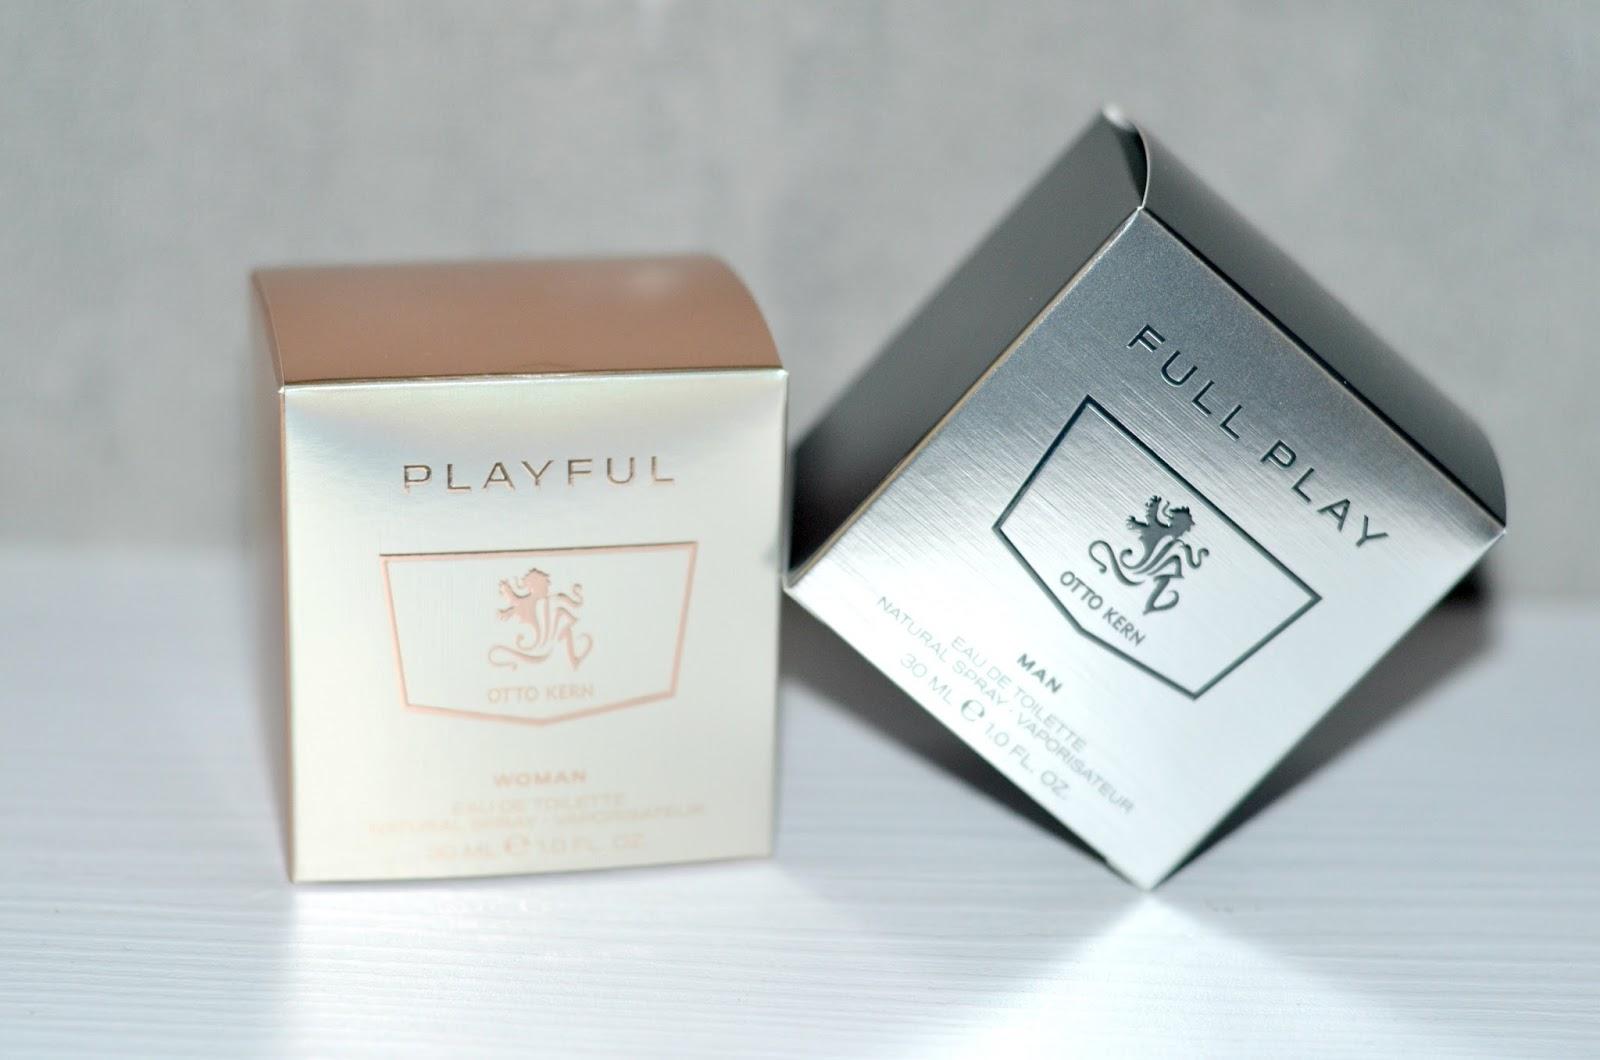 produktvorstellung otto kern 39 playful full play 39 nina 39 s kosmetick. Black Bedroom Furniture Sets. Home Design Ideas